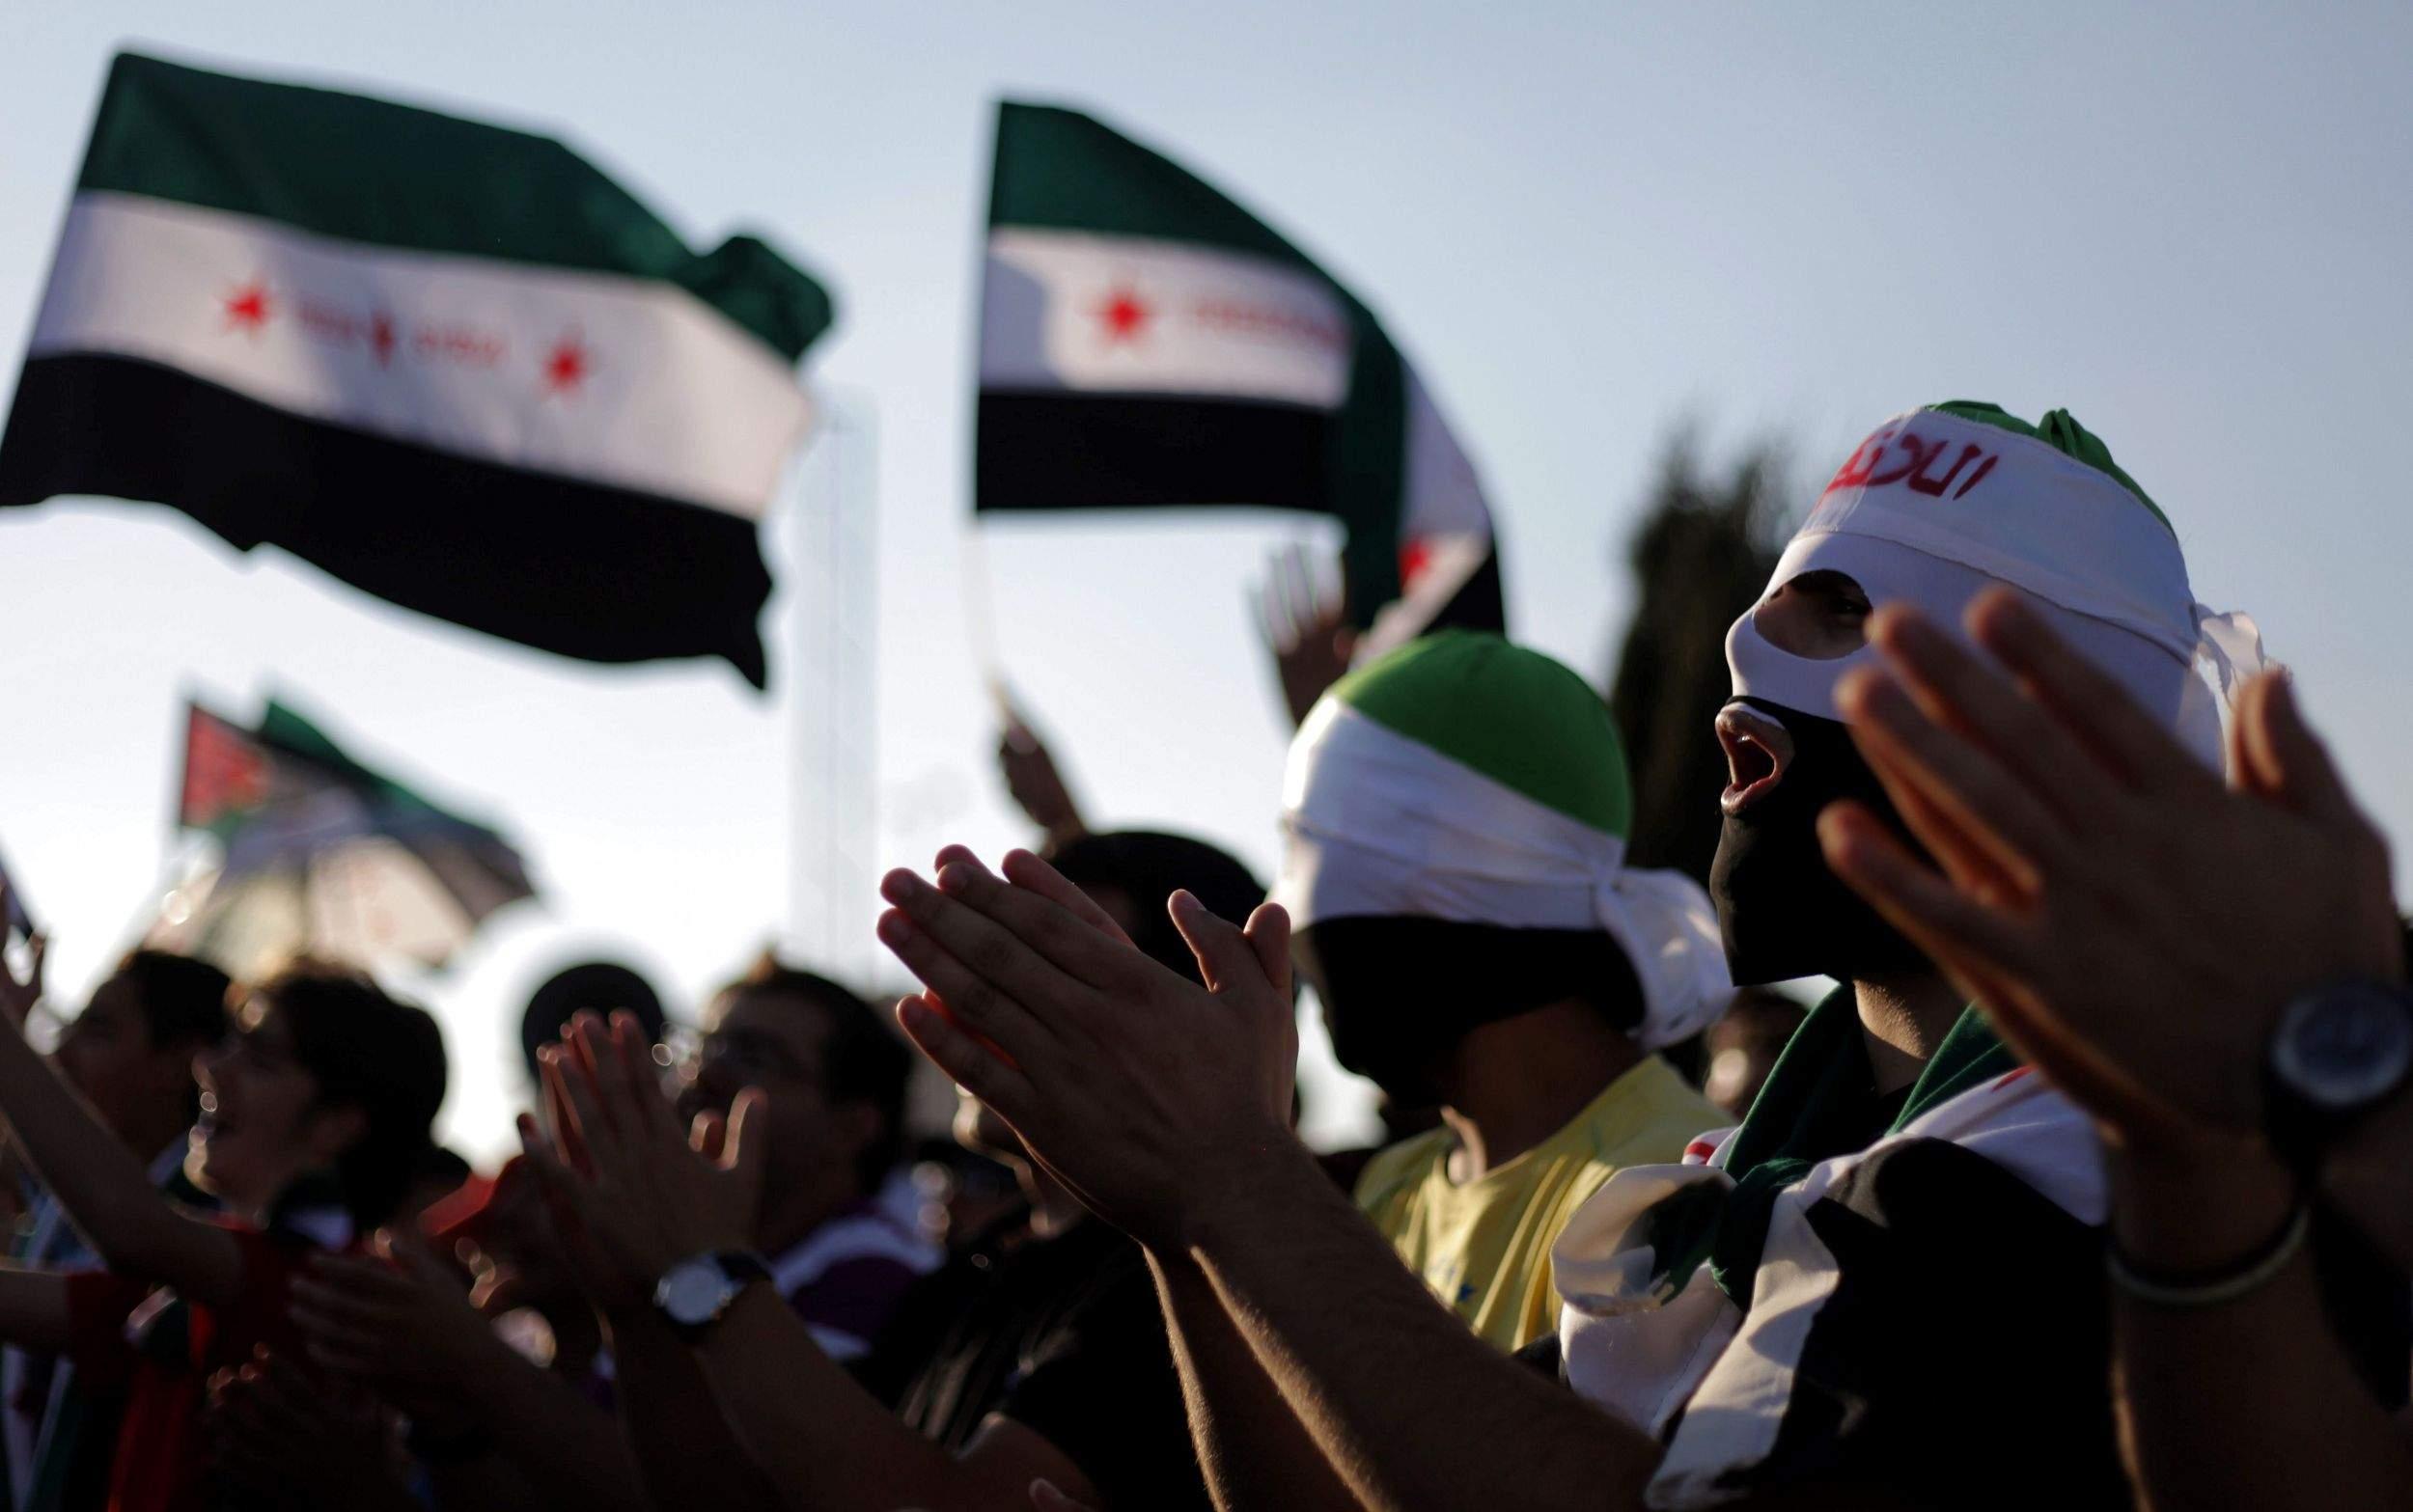 Demonstrations against the Syrian regime in the capital of Jordan, Amman, in 2011 (AP)